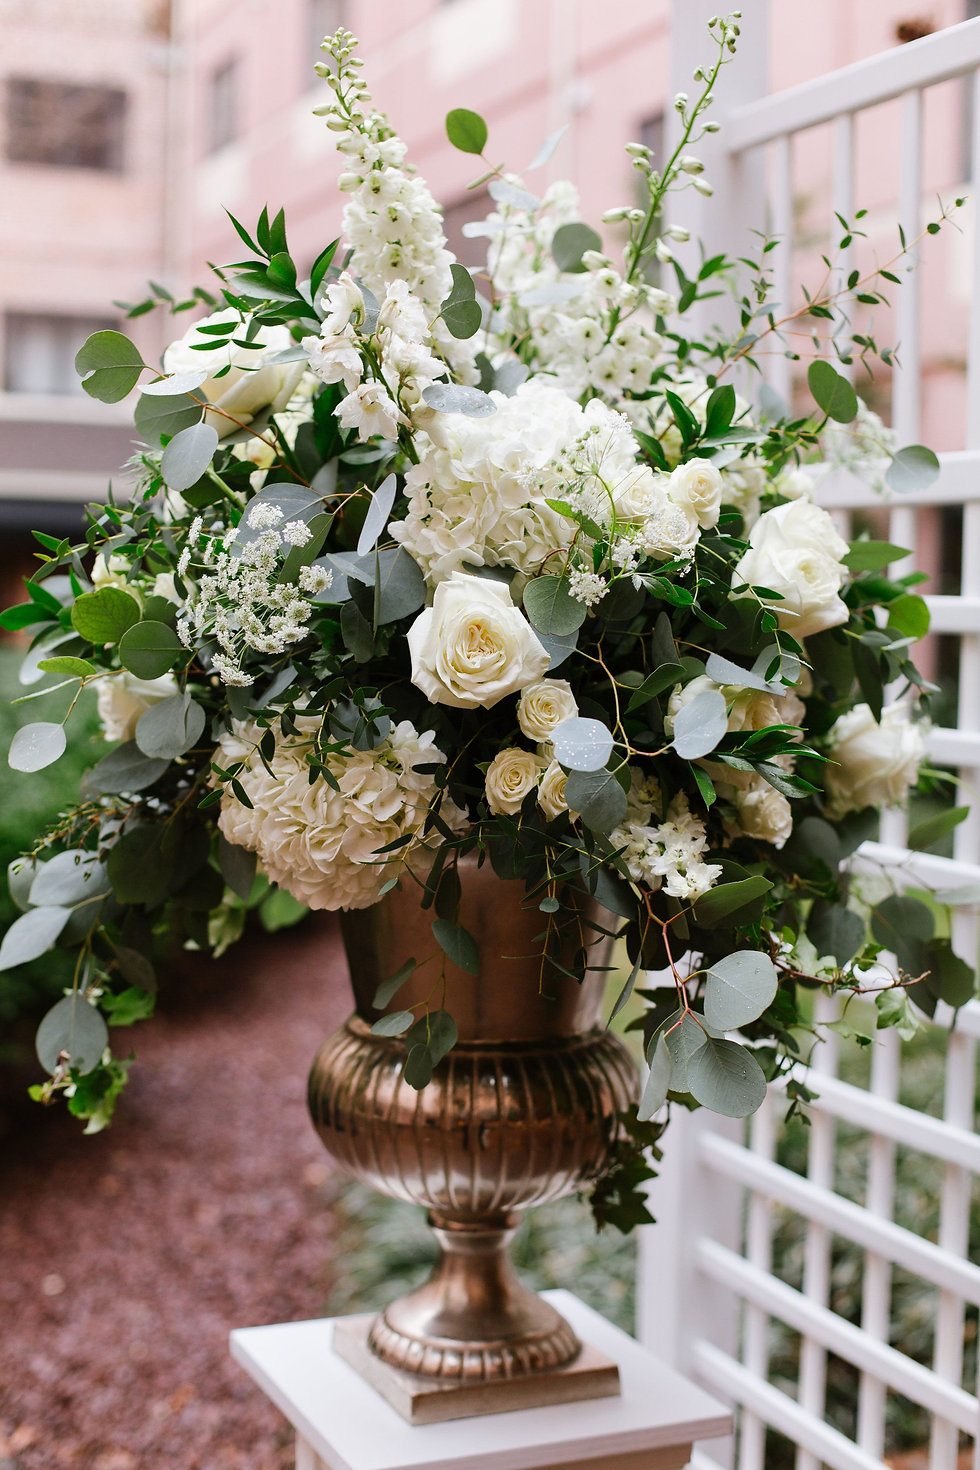 Flowers & Fancies, Baltimore MD Florist.